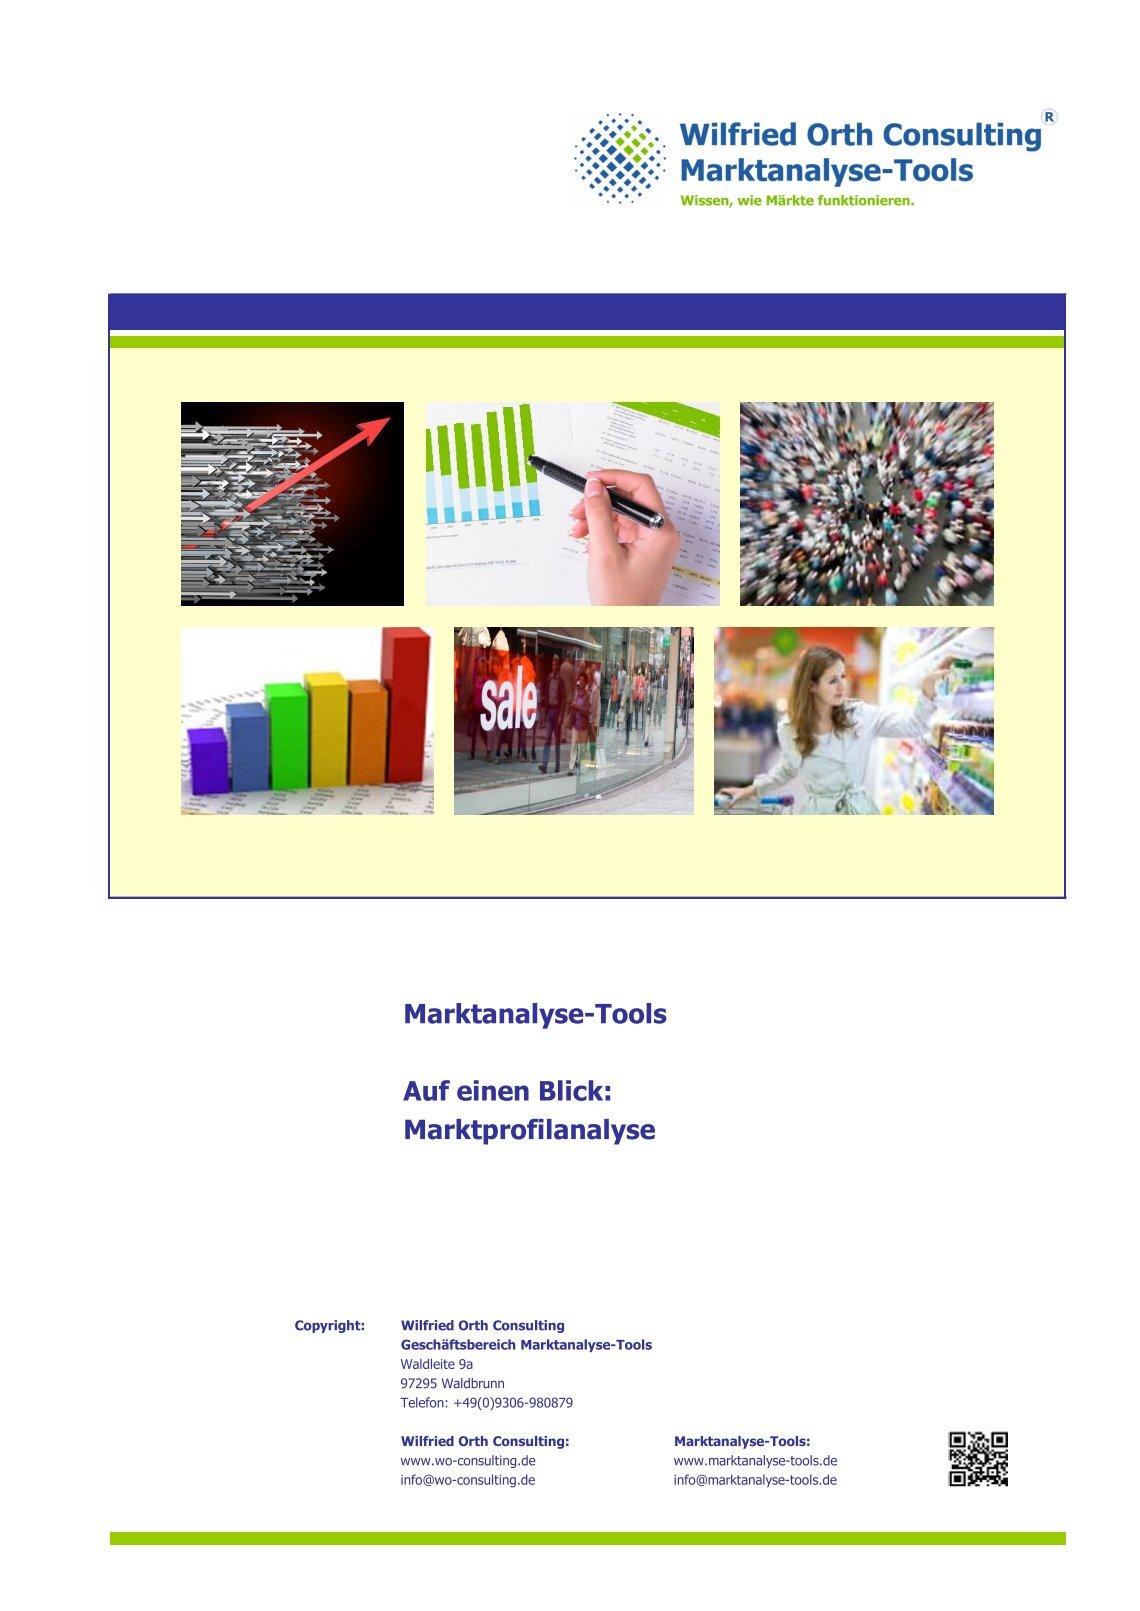 1 free Magazines from KOSTENLOS.MARKTANALYSE.TOOLS.DE